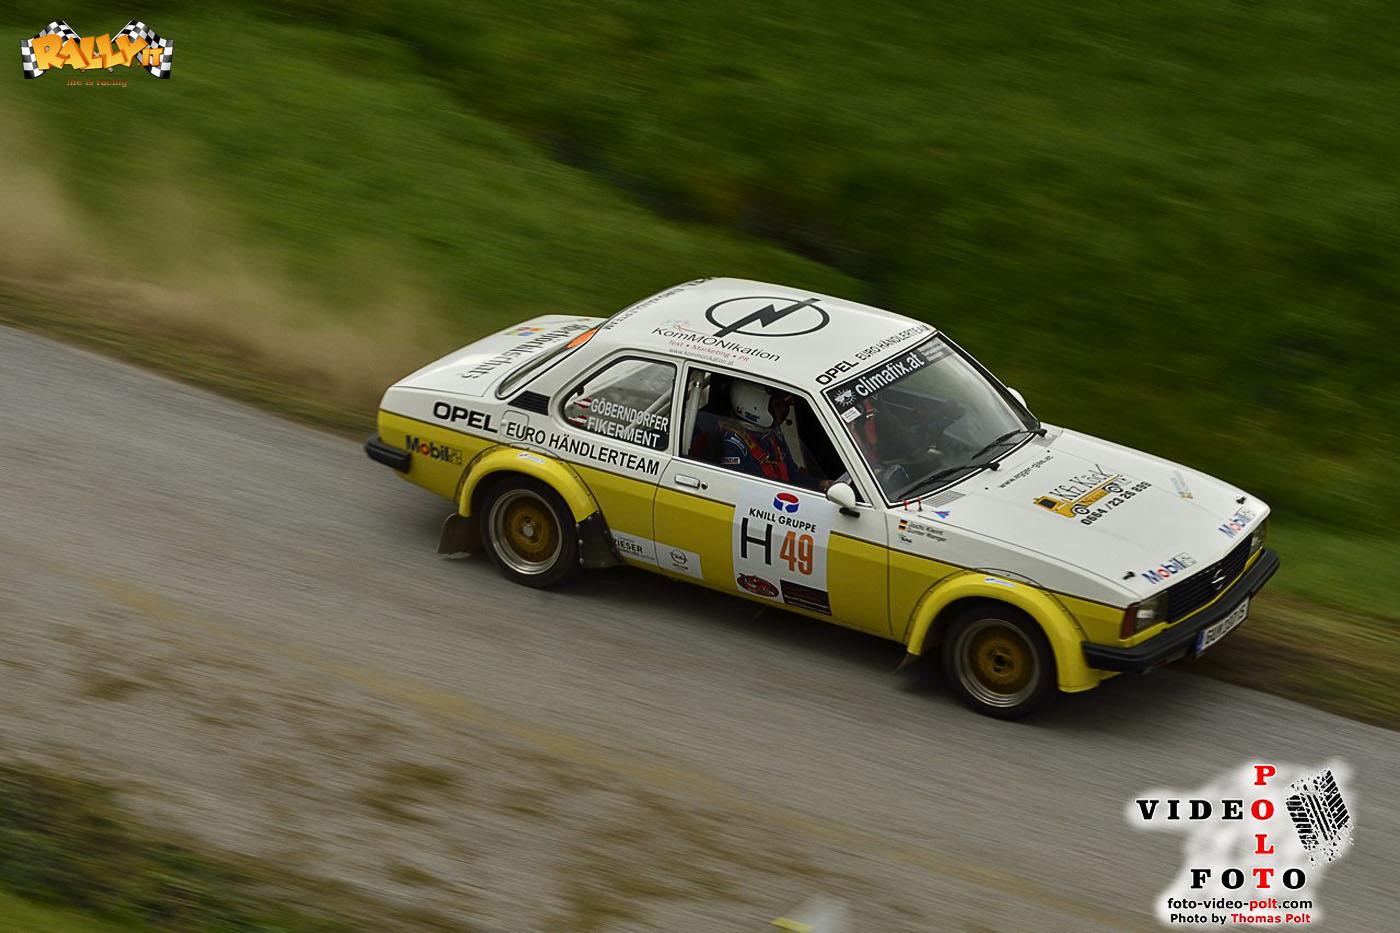 003-ORM Rallye Weiz-2014-Thomas Polt-Rally-it.jpg